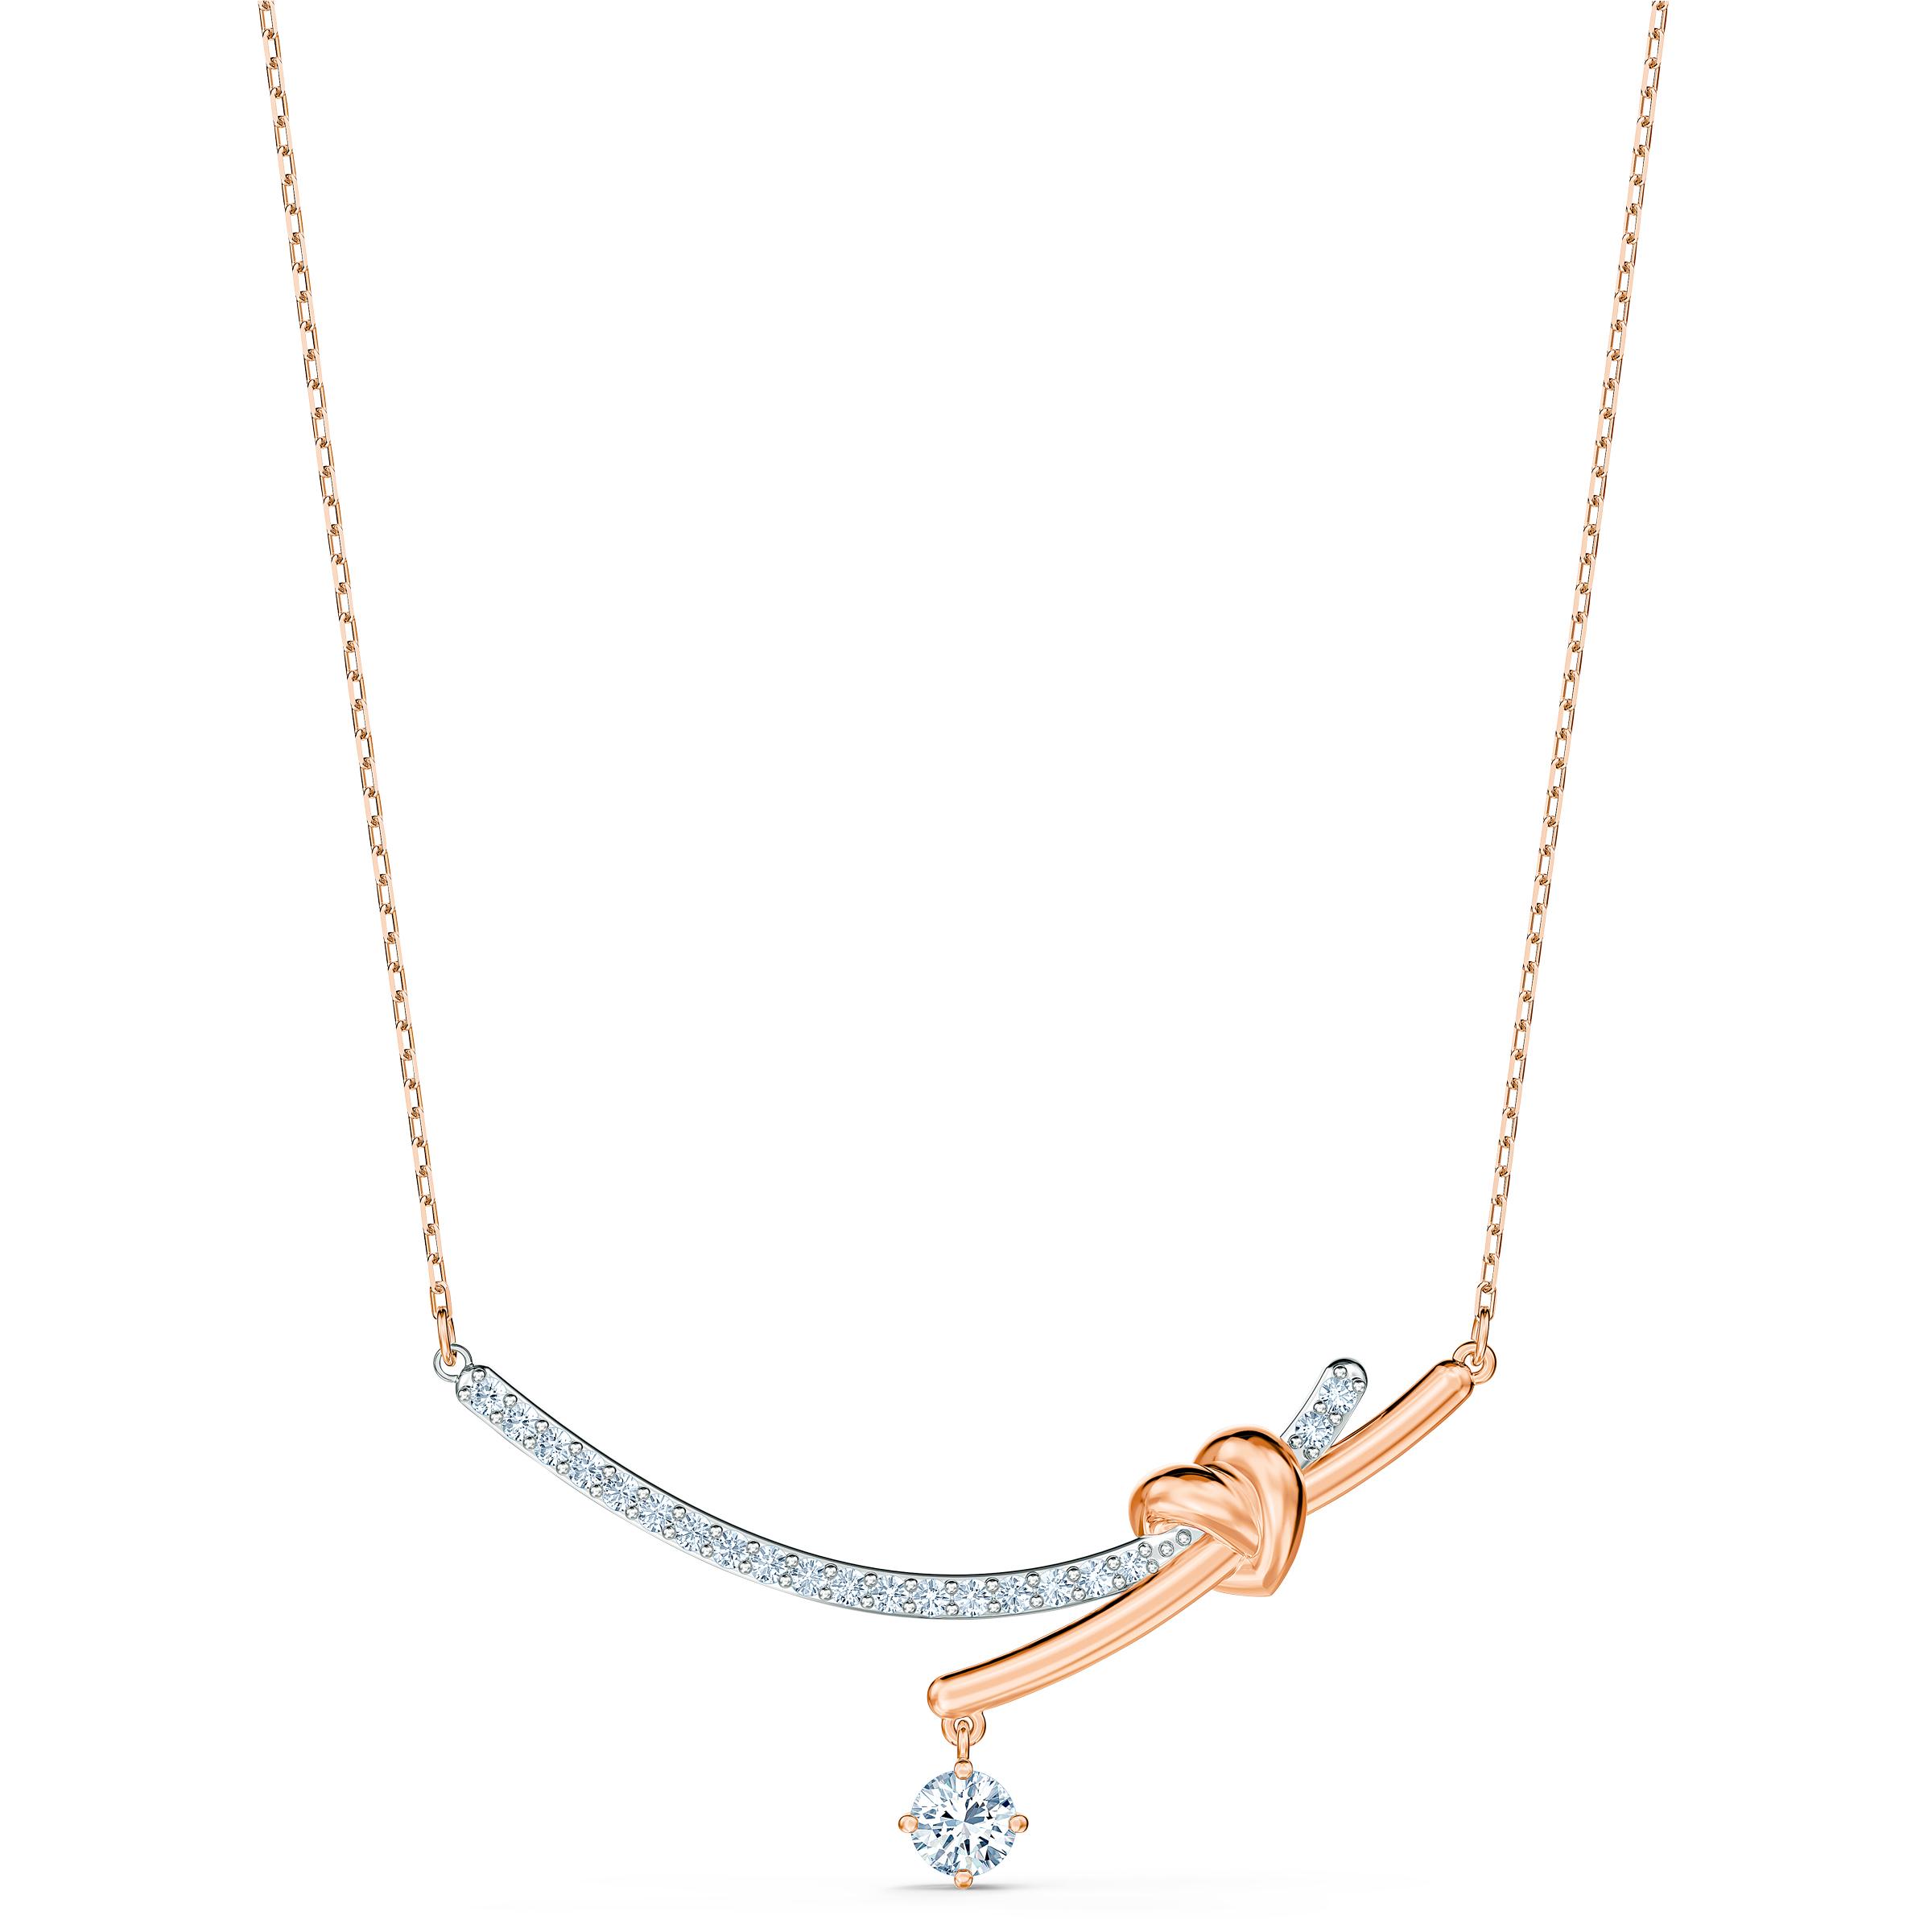 Collier Lifelong Heart, blanc, finition mix de métal, Swarovski